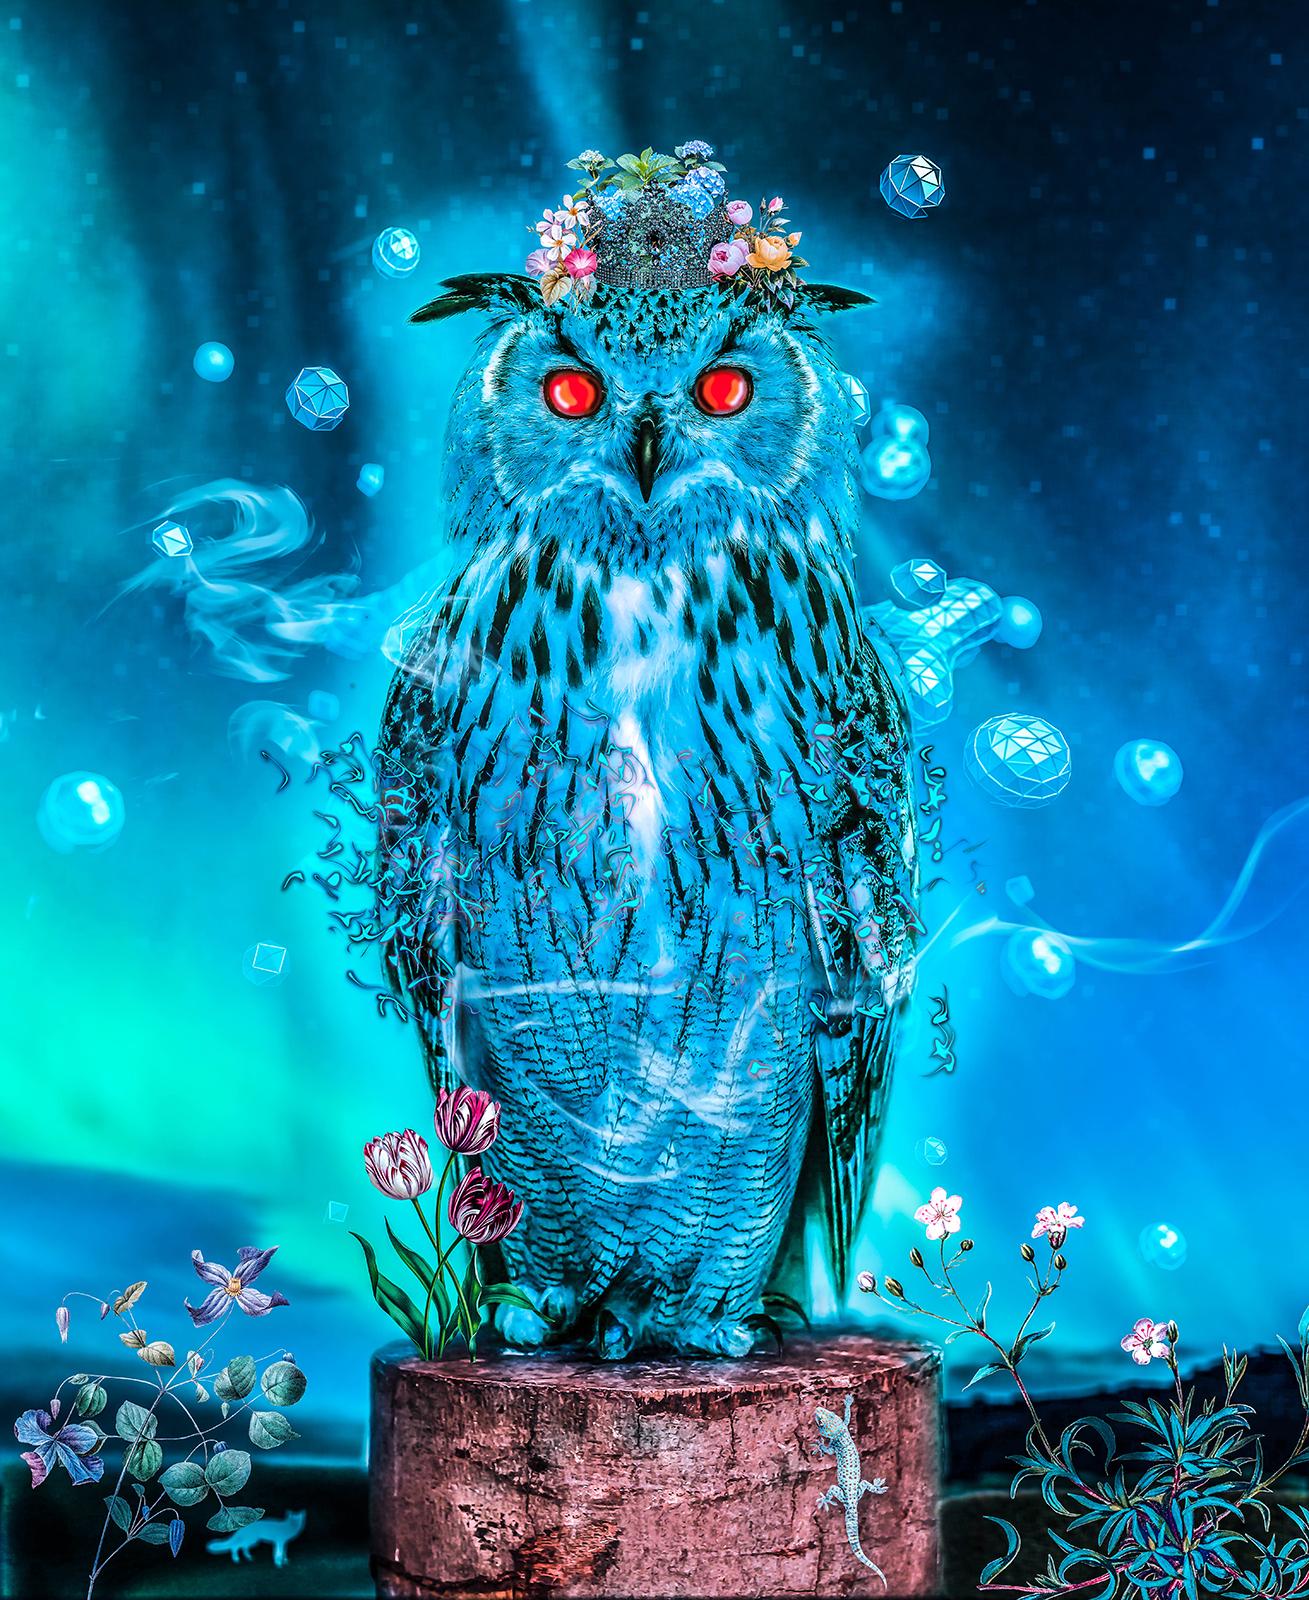 Ritaisabel sapphire owl 1 5f109003 tq1n